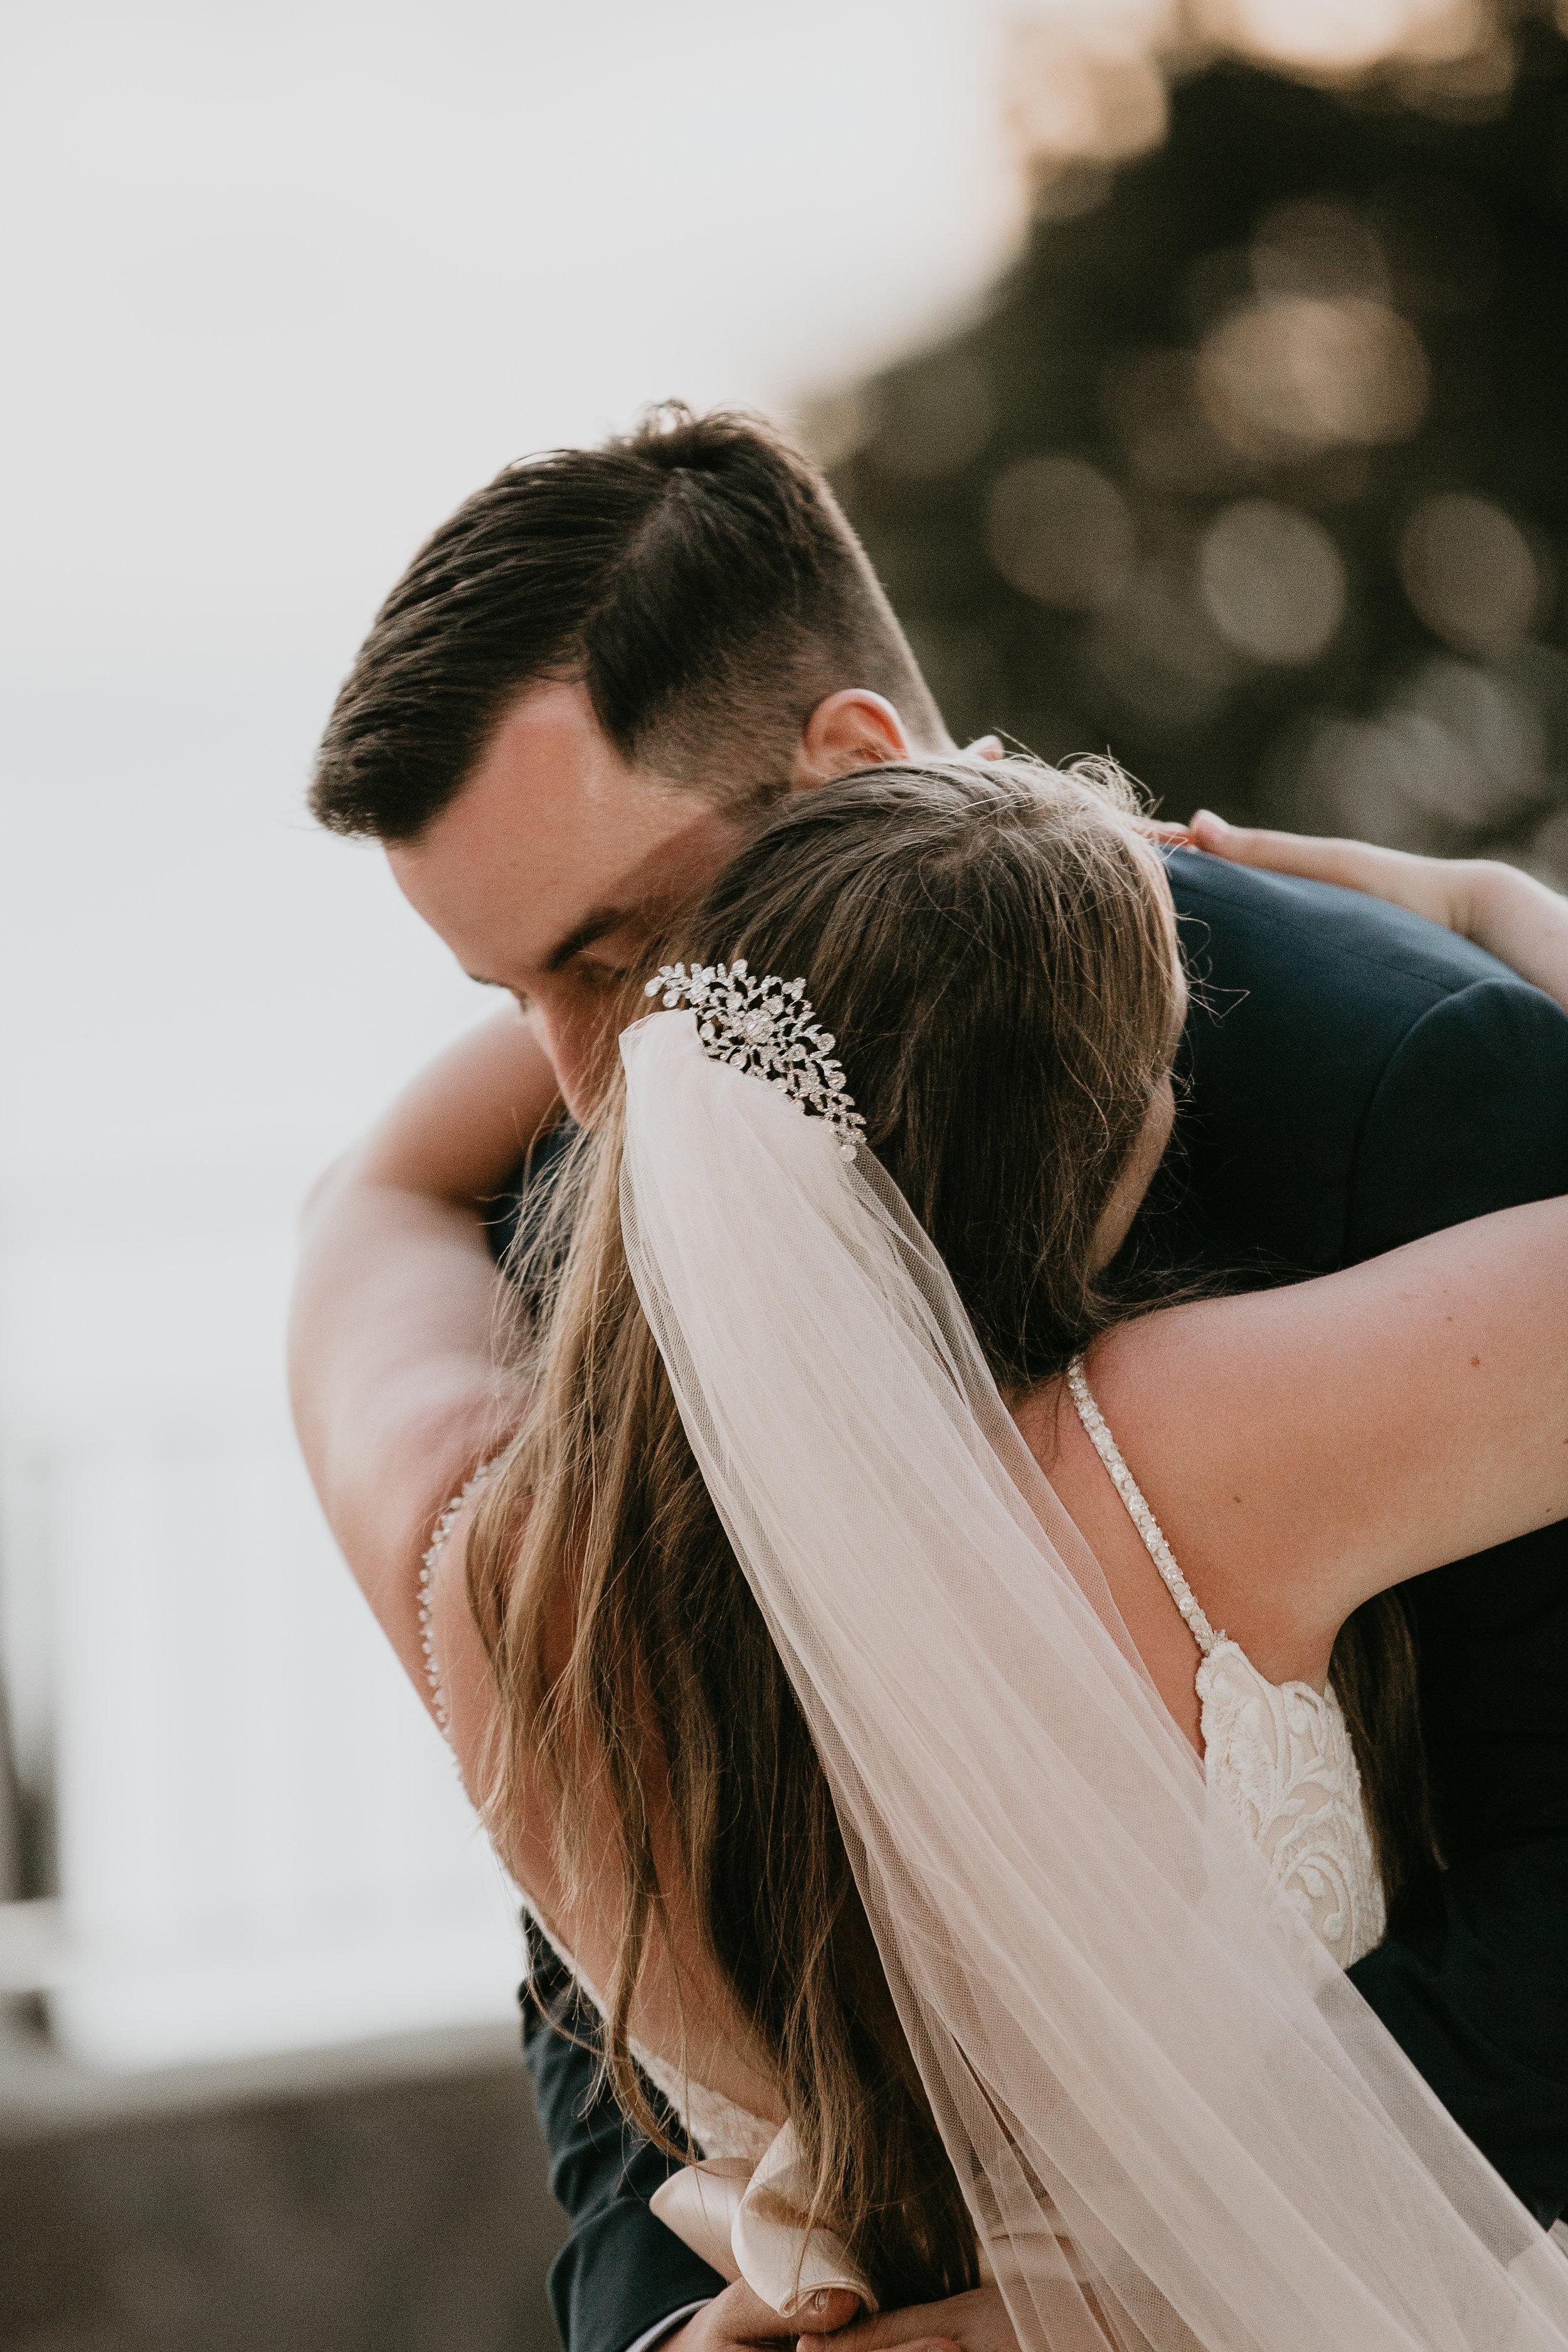 nicole-daacke-photography-destination-wedding-in-st-lucia-sandals-la-toc-intimate-island-wedding-carribean-elopement-photographer-chill-island-wedding-135.jpg